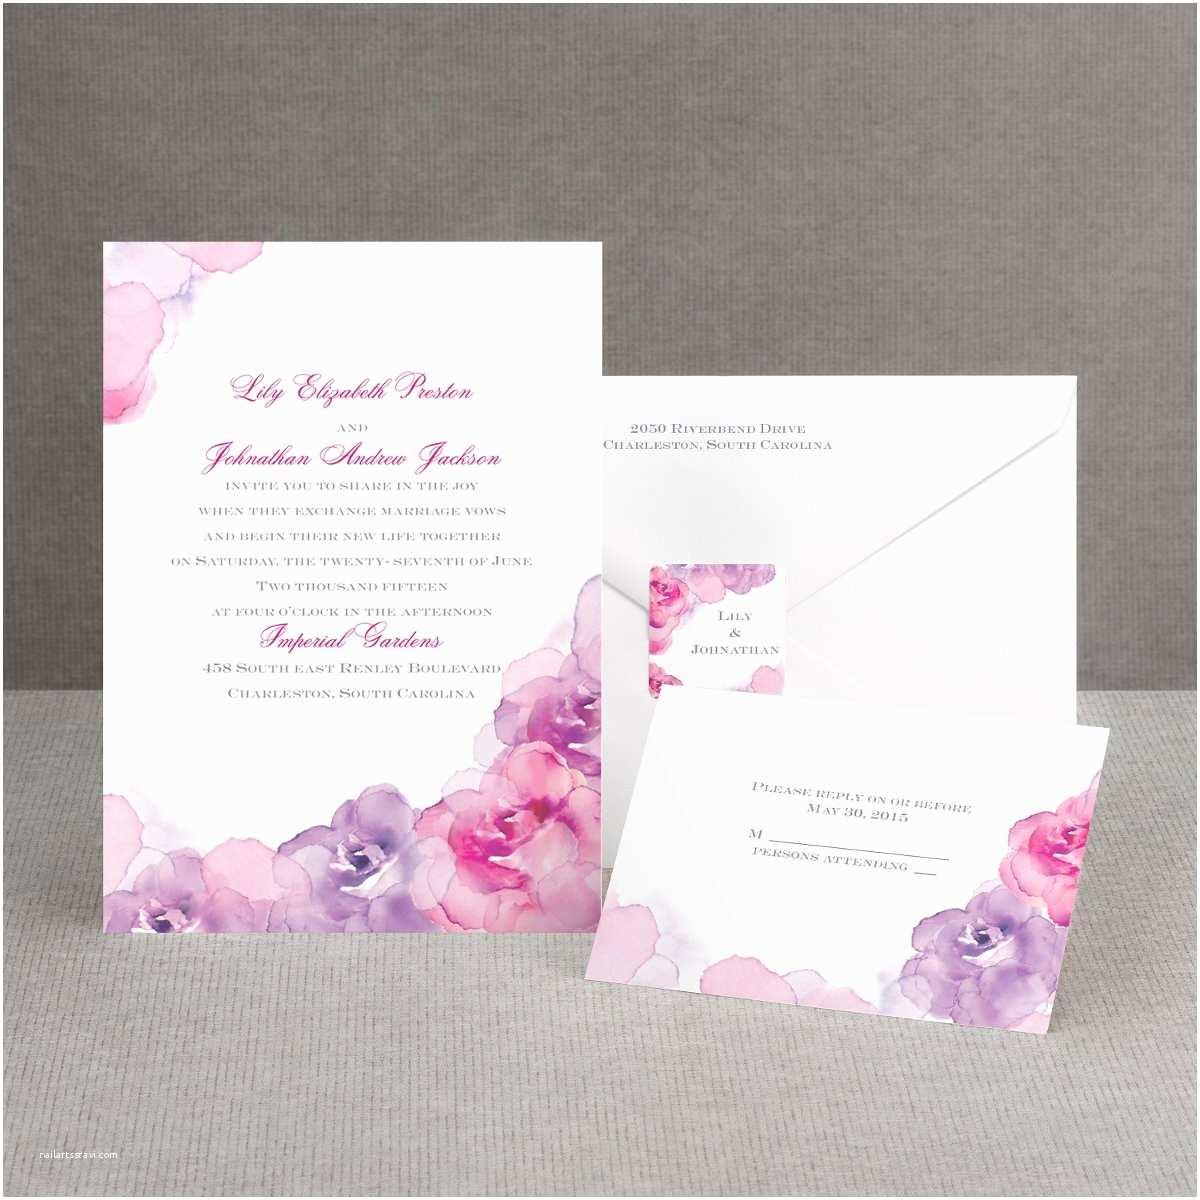 Watercolour Wedding Invitations Tipful Tuesday Watercolor Wedding